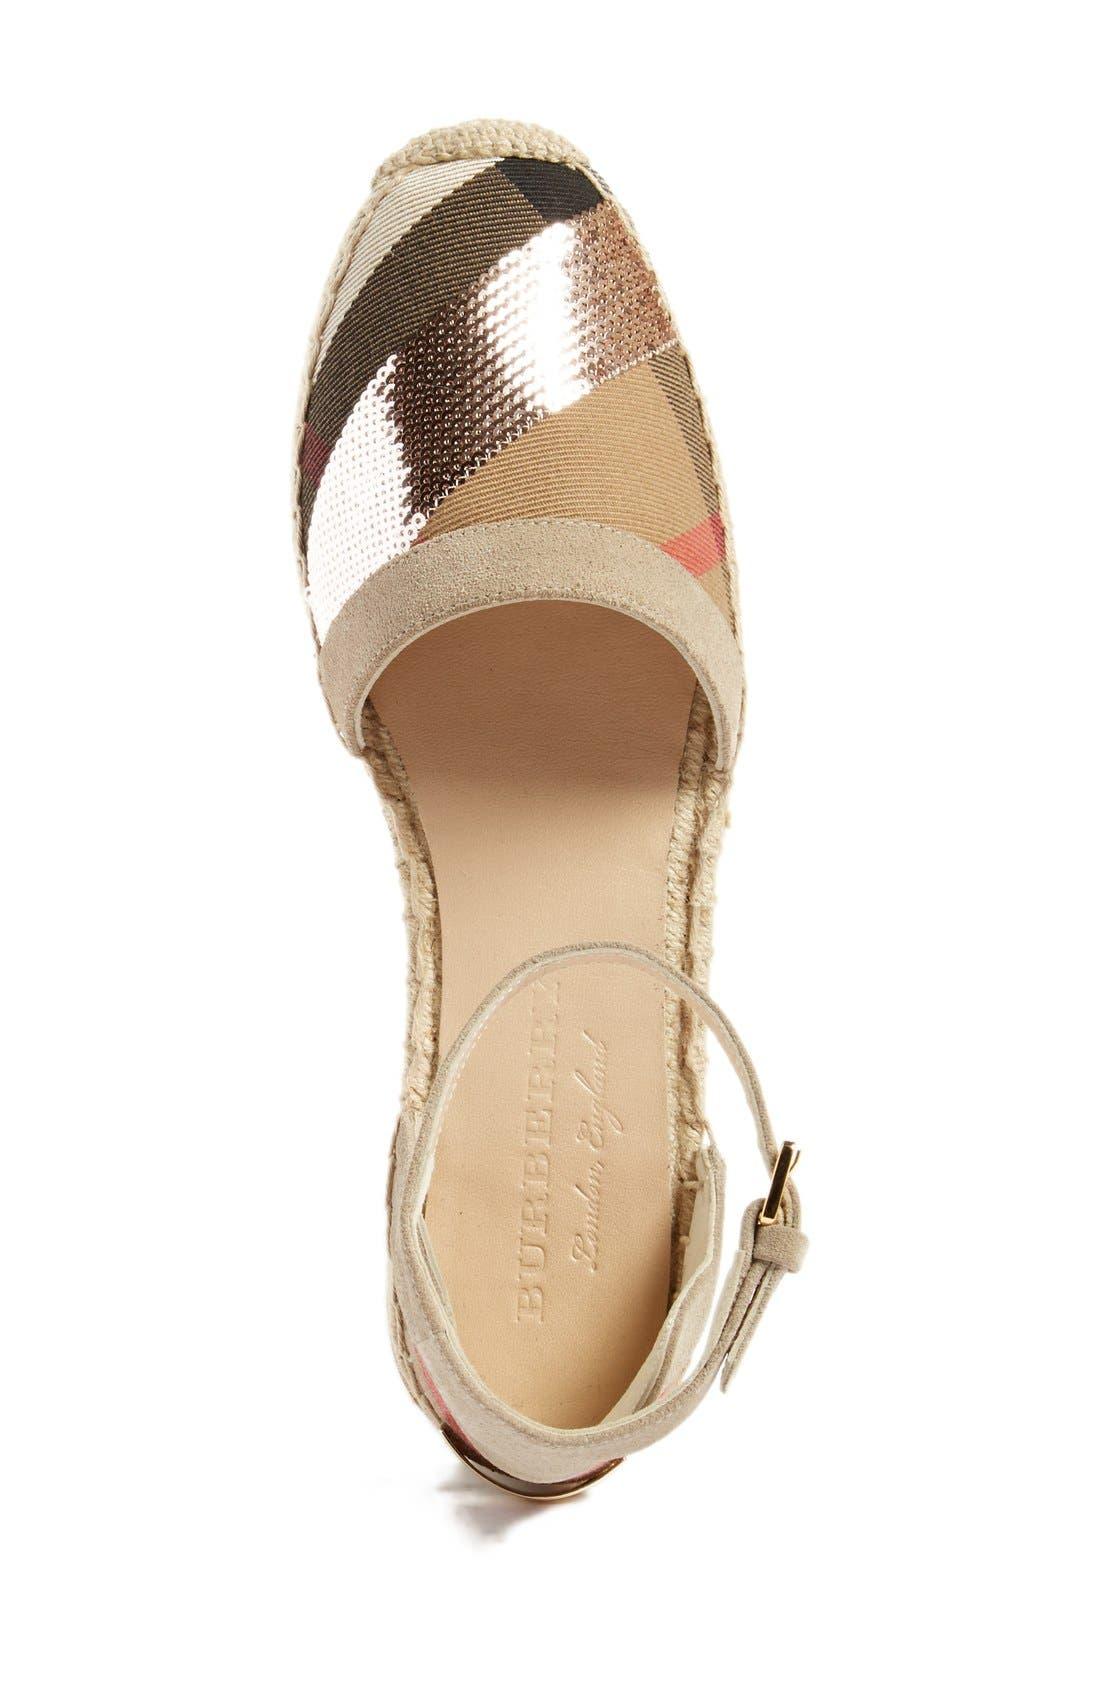 'Abbingdon' Ankle Strap Espadrille Sandal,                             Alternate thumbnail 3, color,                             Grey/ Pale Pink